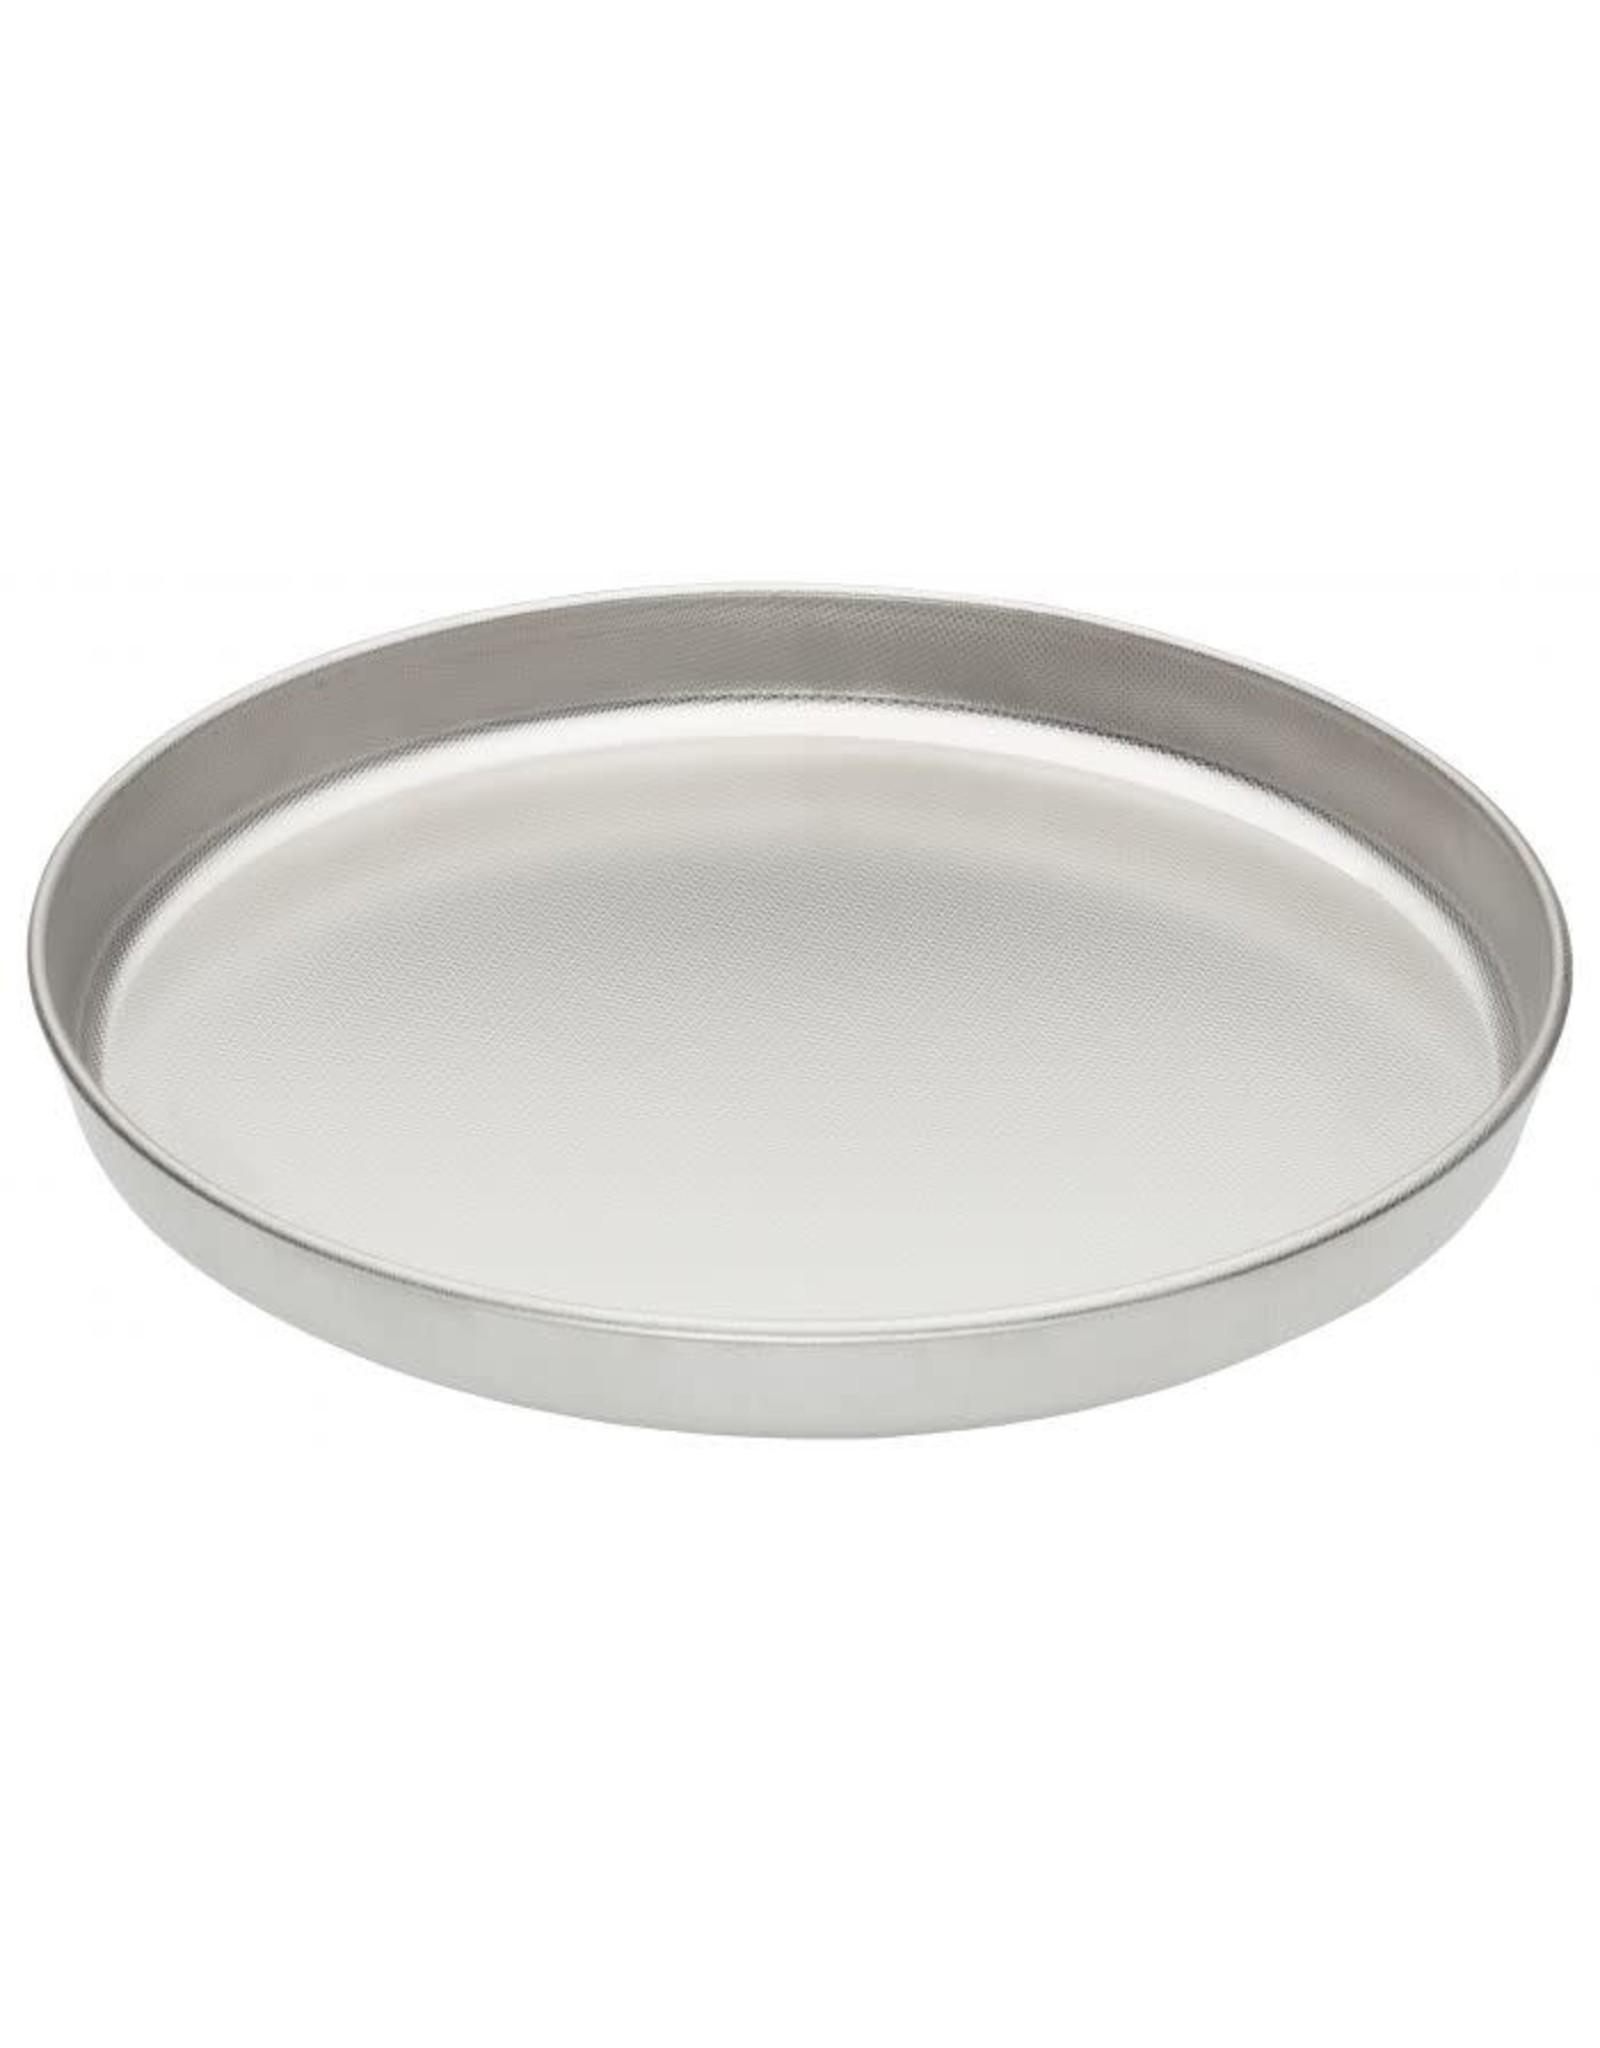 "Cousin Serafin's Micro Textured Pizza Pan, 13"" Stainless Steel"